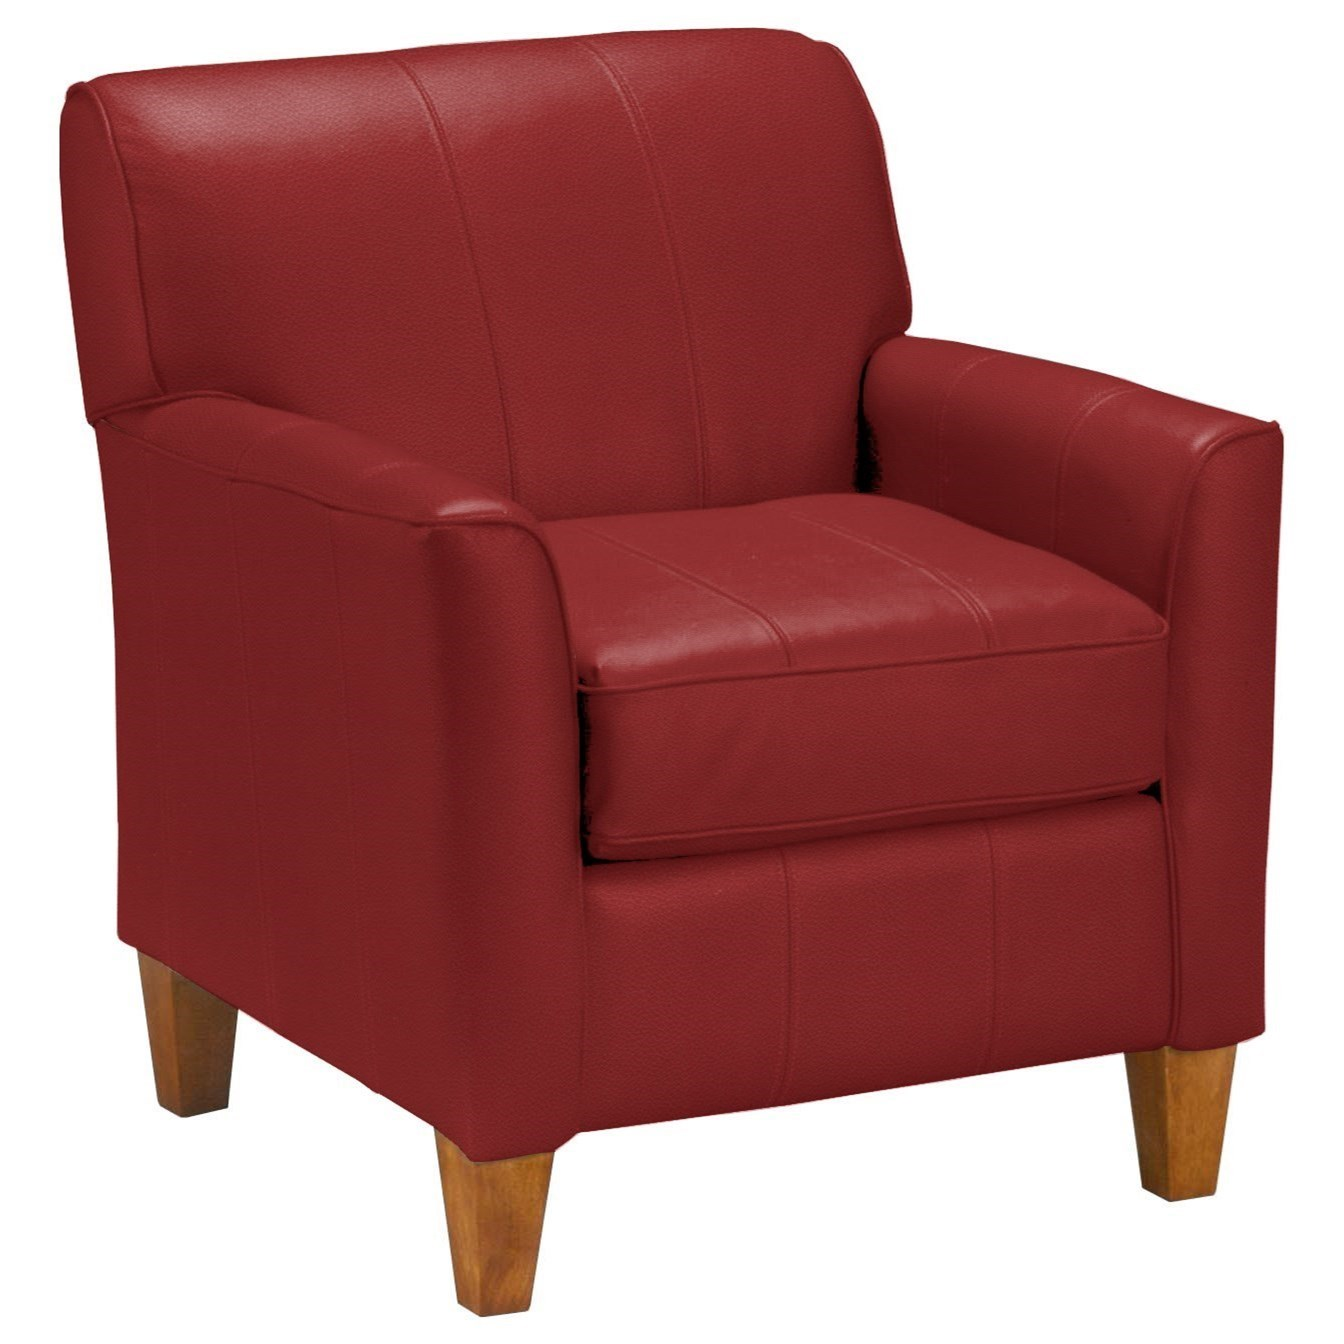 Best Home Furnishings Chairs - Club Risa Club Chair - Item Number: 4190-24628U